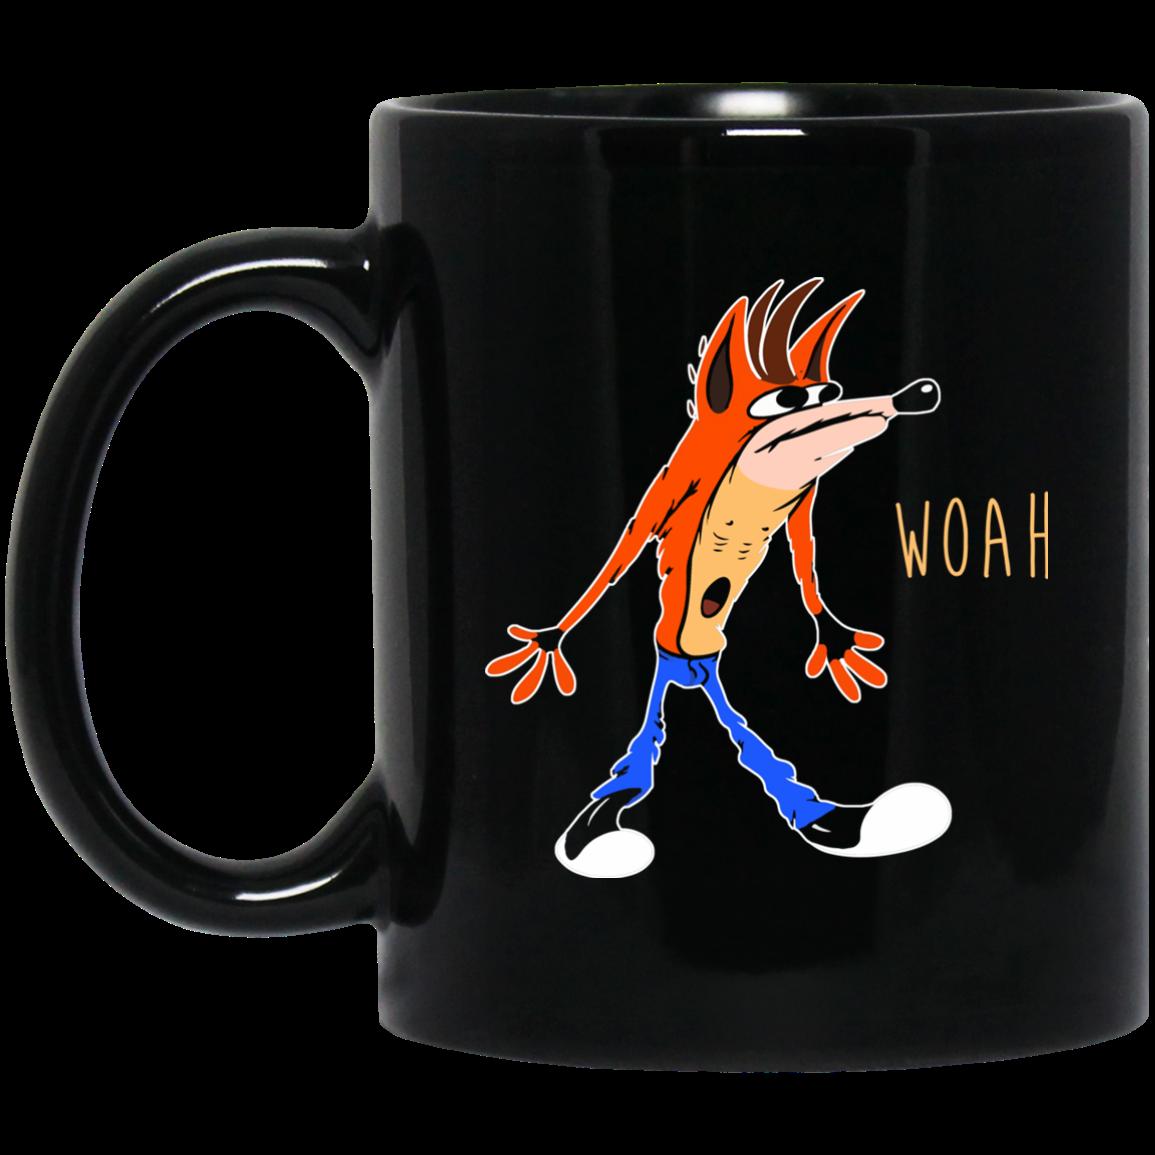 Crash Bandicoot Woah Coffee Mugs 8dix Fashion Crash Bandicoot Bandicoot Mugs